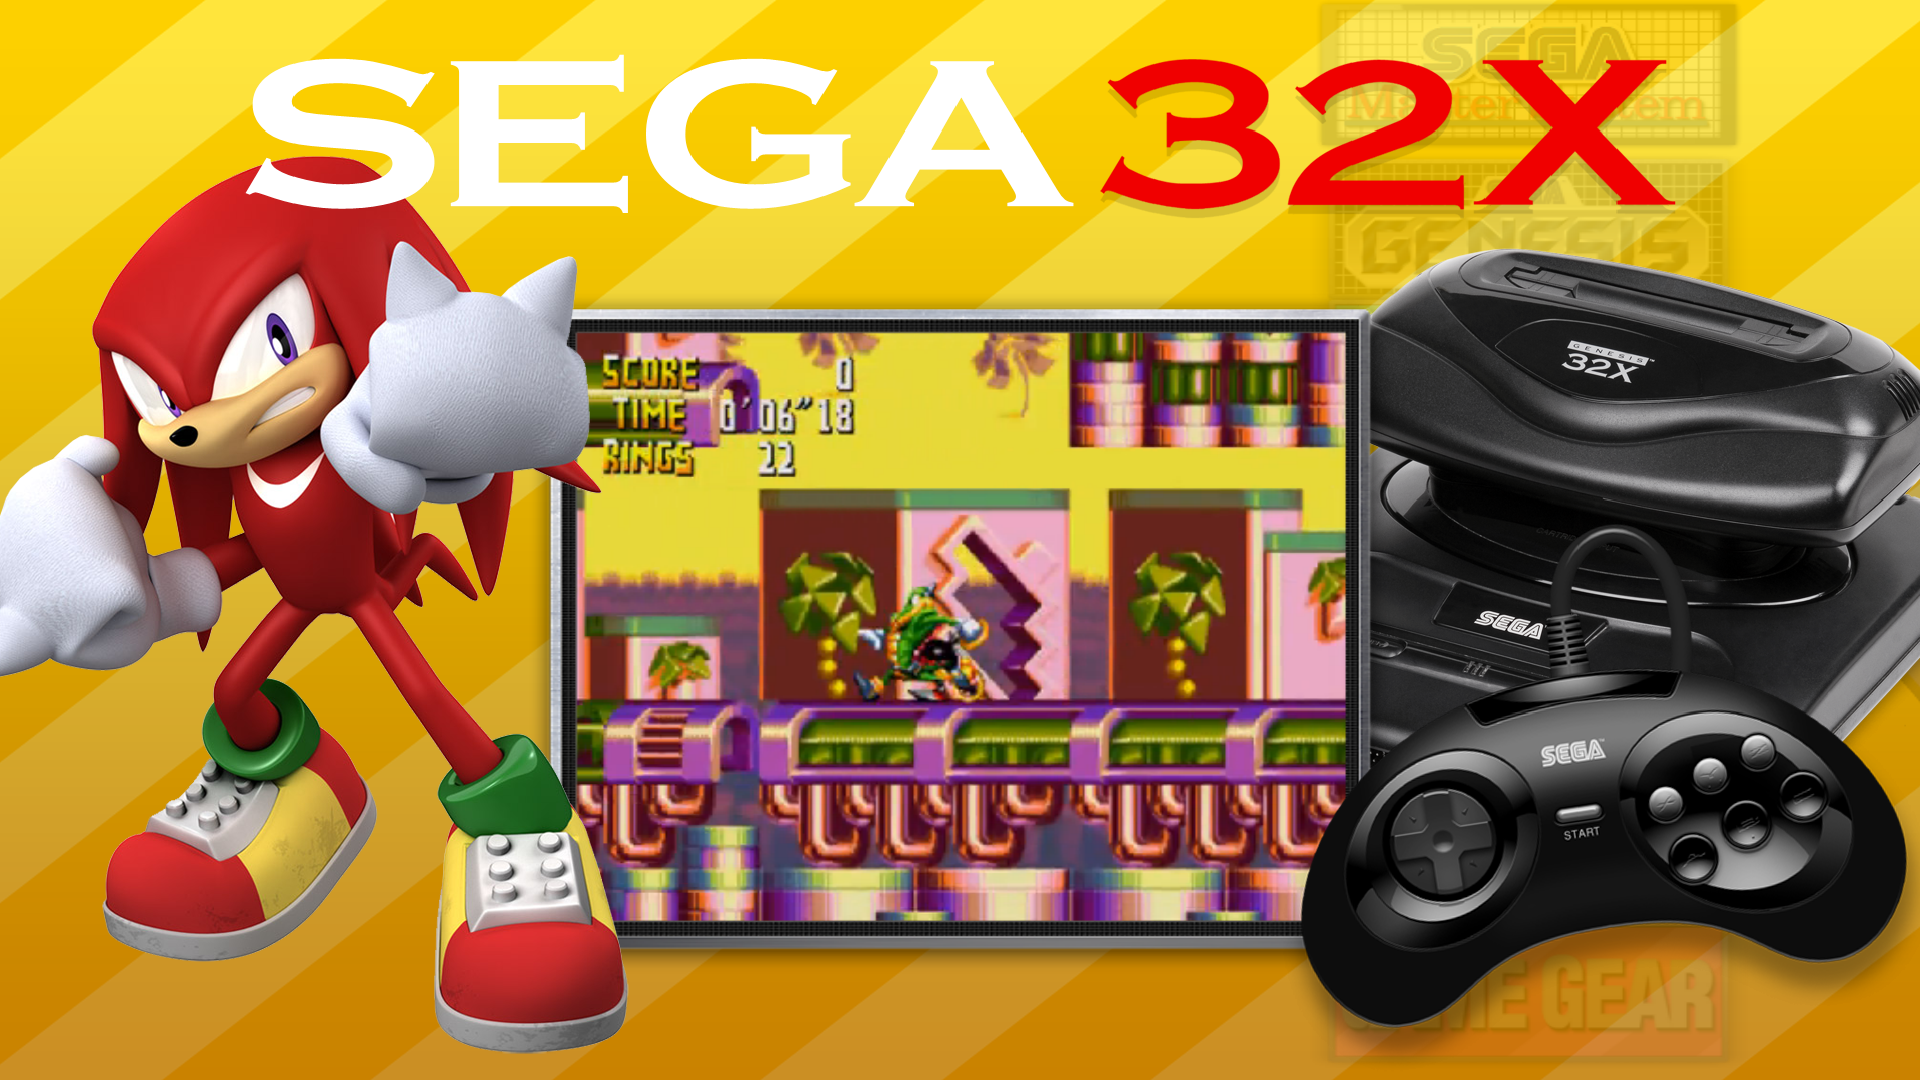 Sega 32X - Main Menu (16:9ST) - Main Menu Themes - HyperSpin